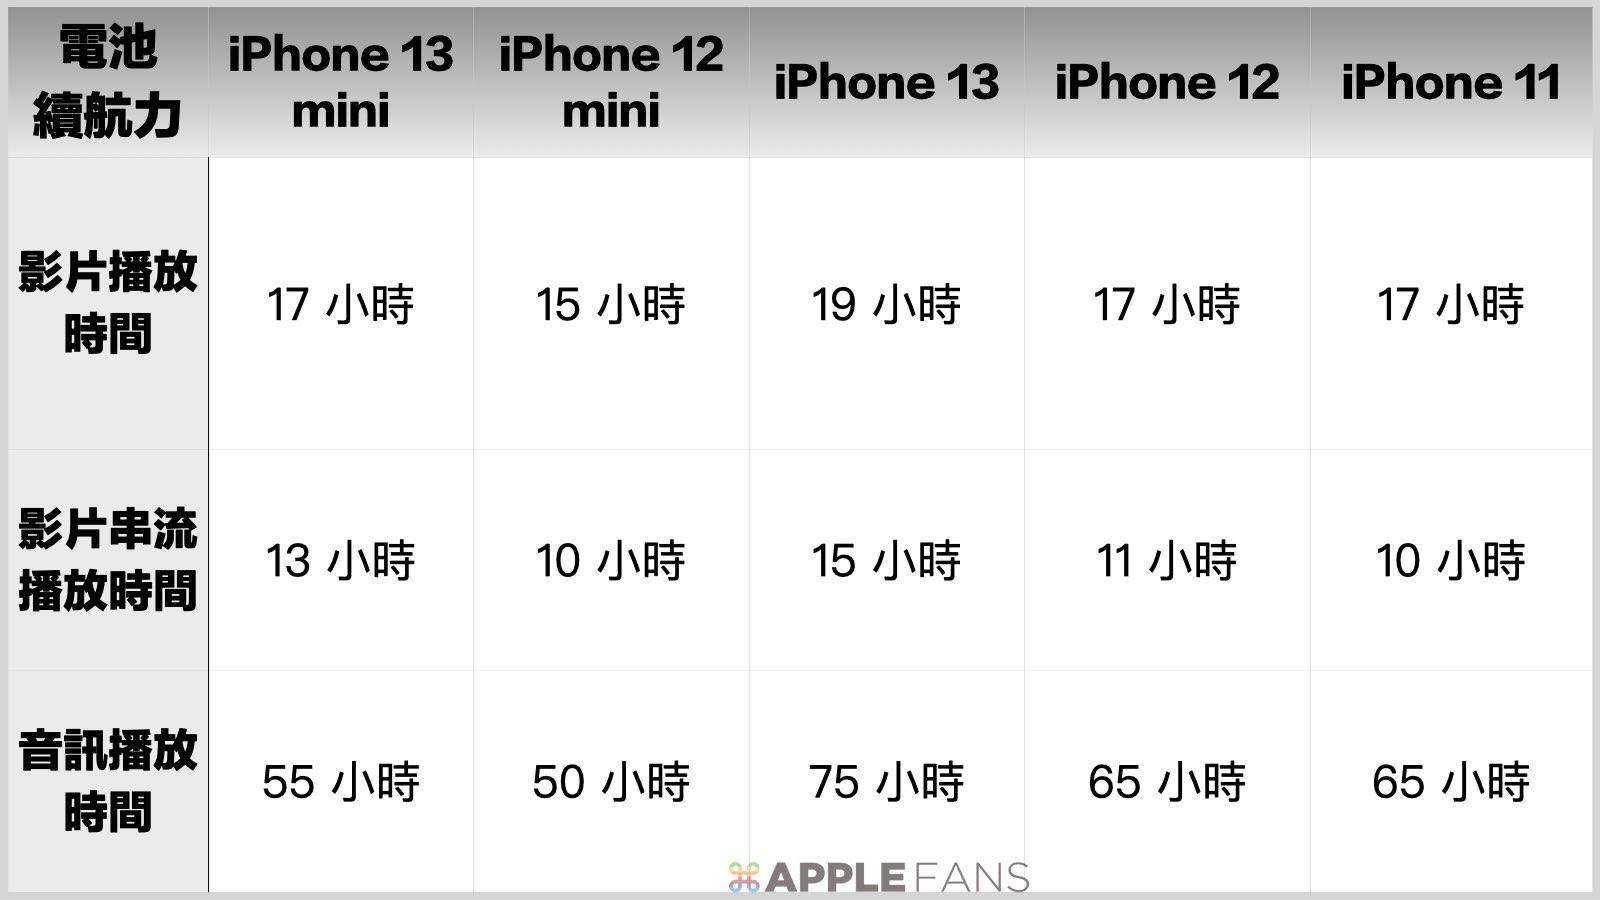 電量續航力比一比 - iPhone 13 mini / iPhone 13 / iPhone 12 mimi / iPhone 12 / iPhone 11